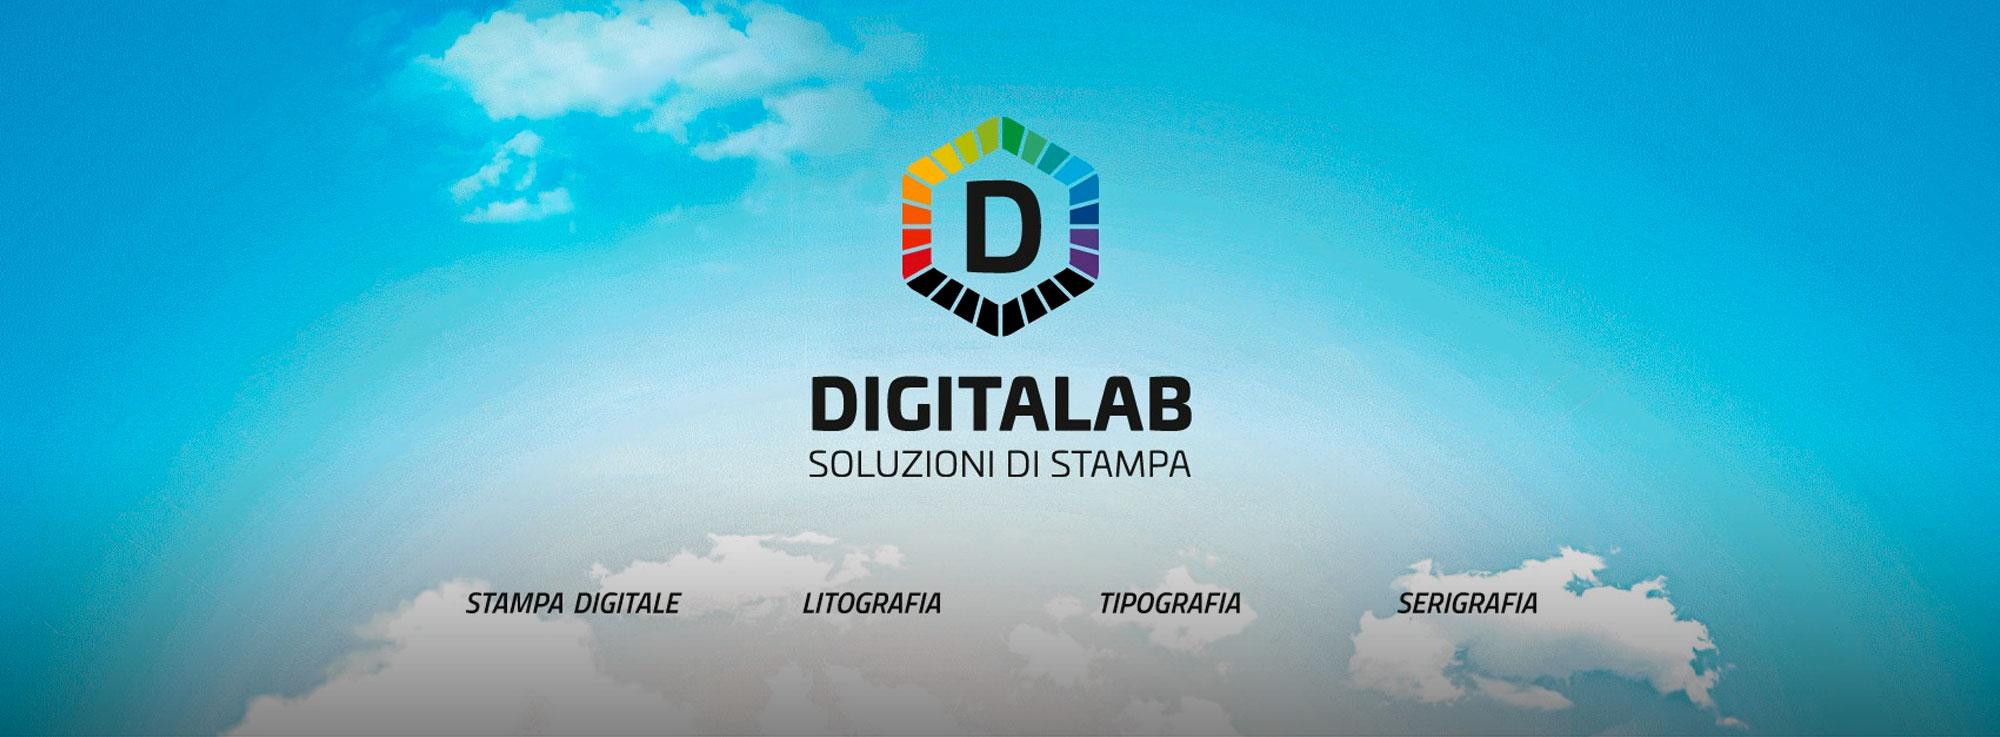 Digitalab Barletta